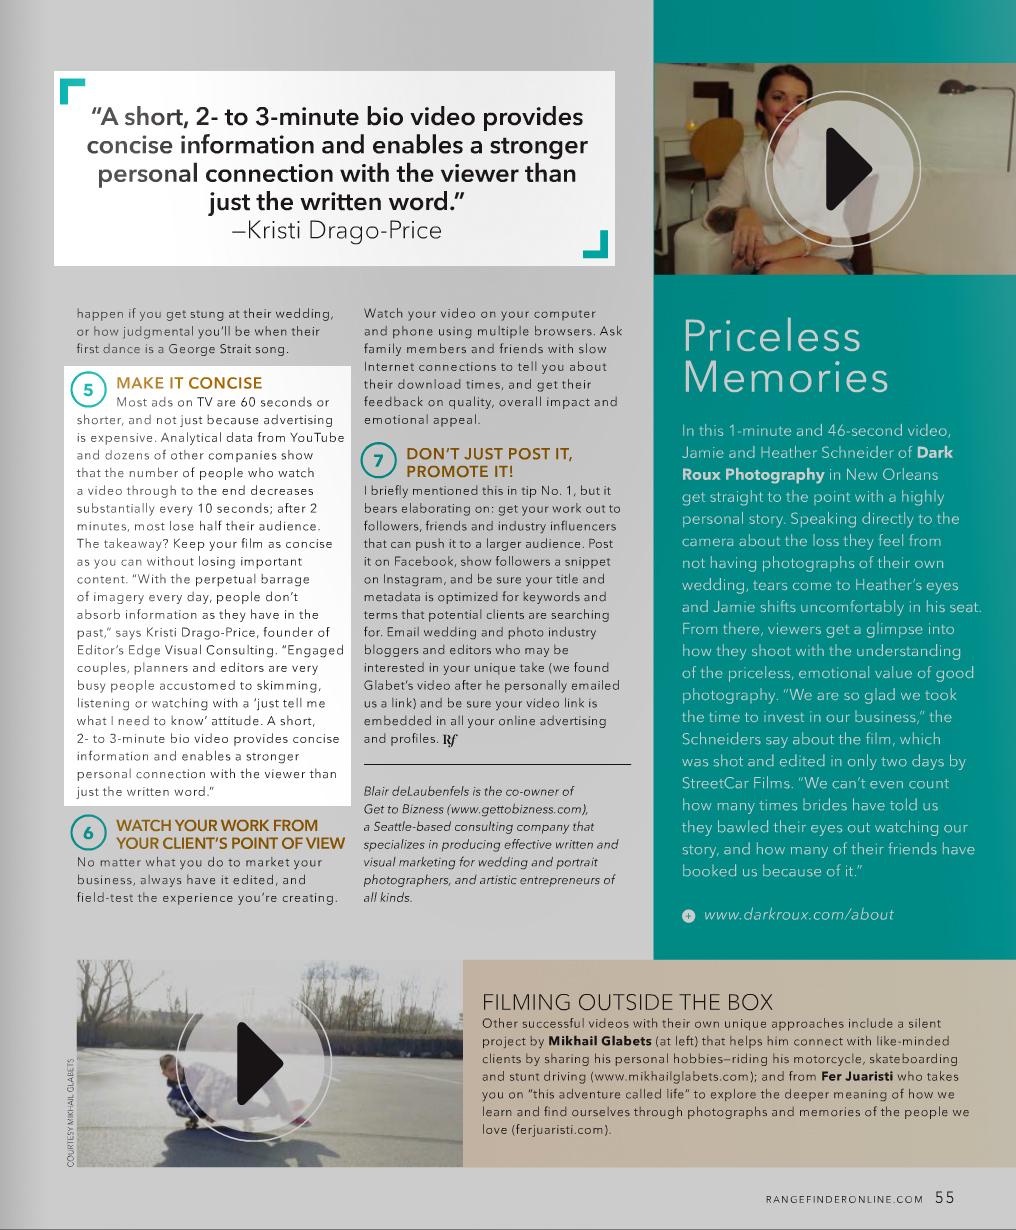 Kristi Drago-Price featured in Rangefinder Magazine   Editor's Edge